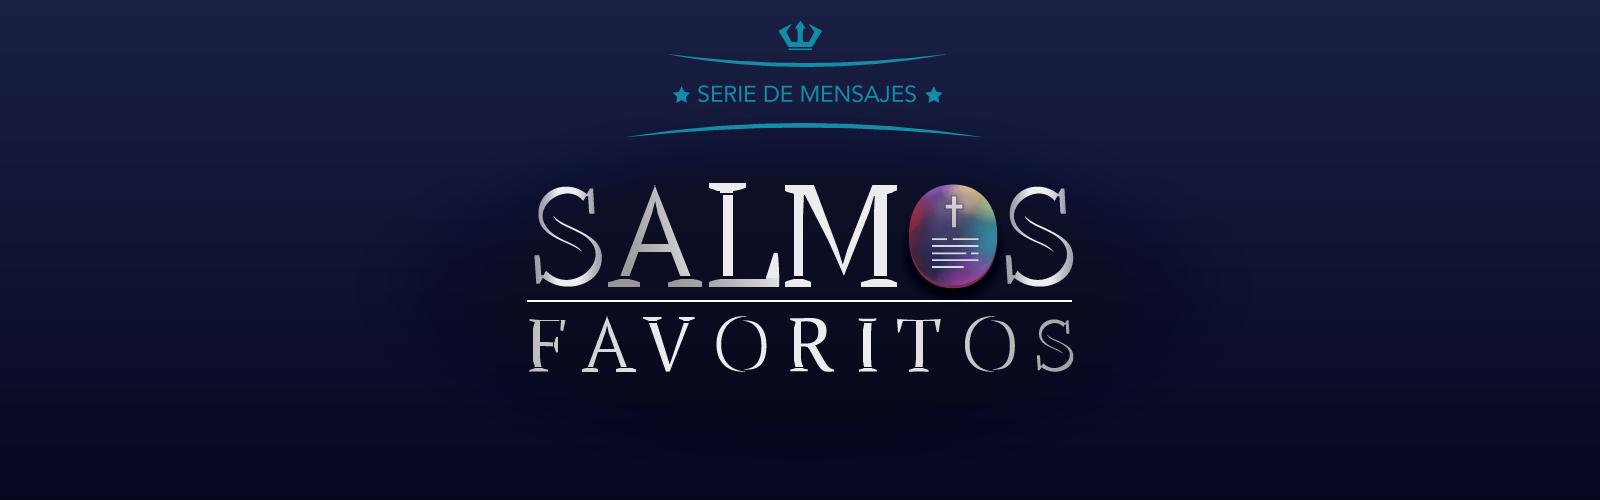 banner_web_salmoF